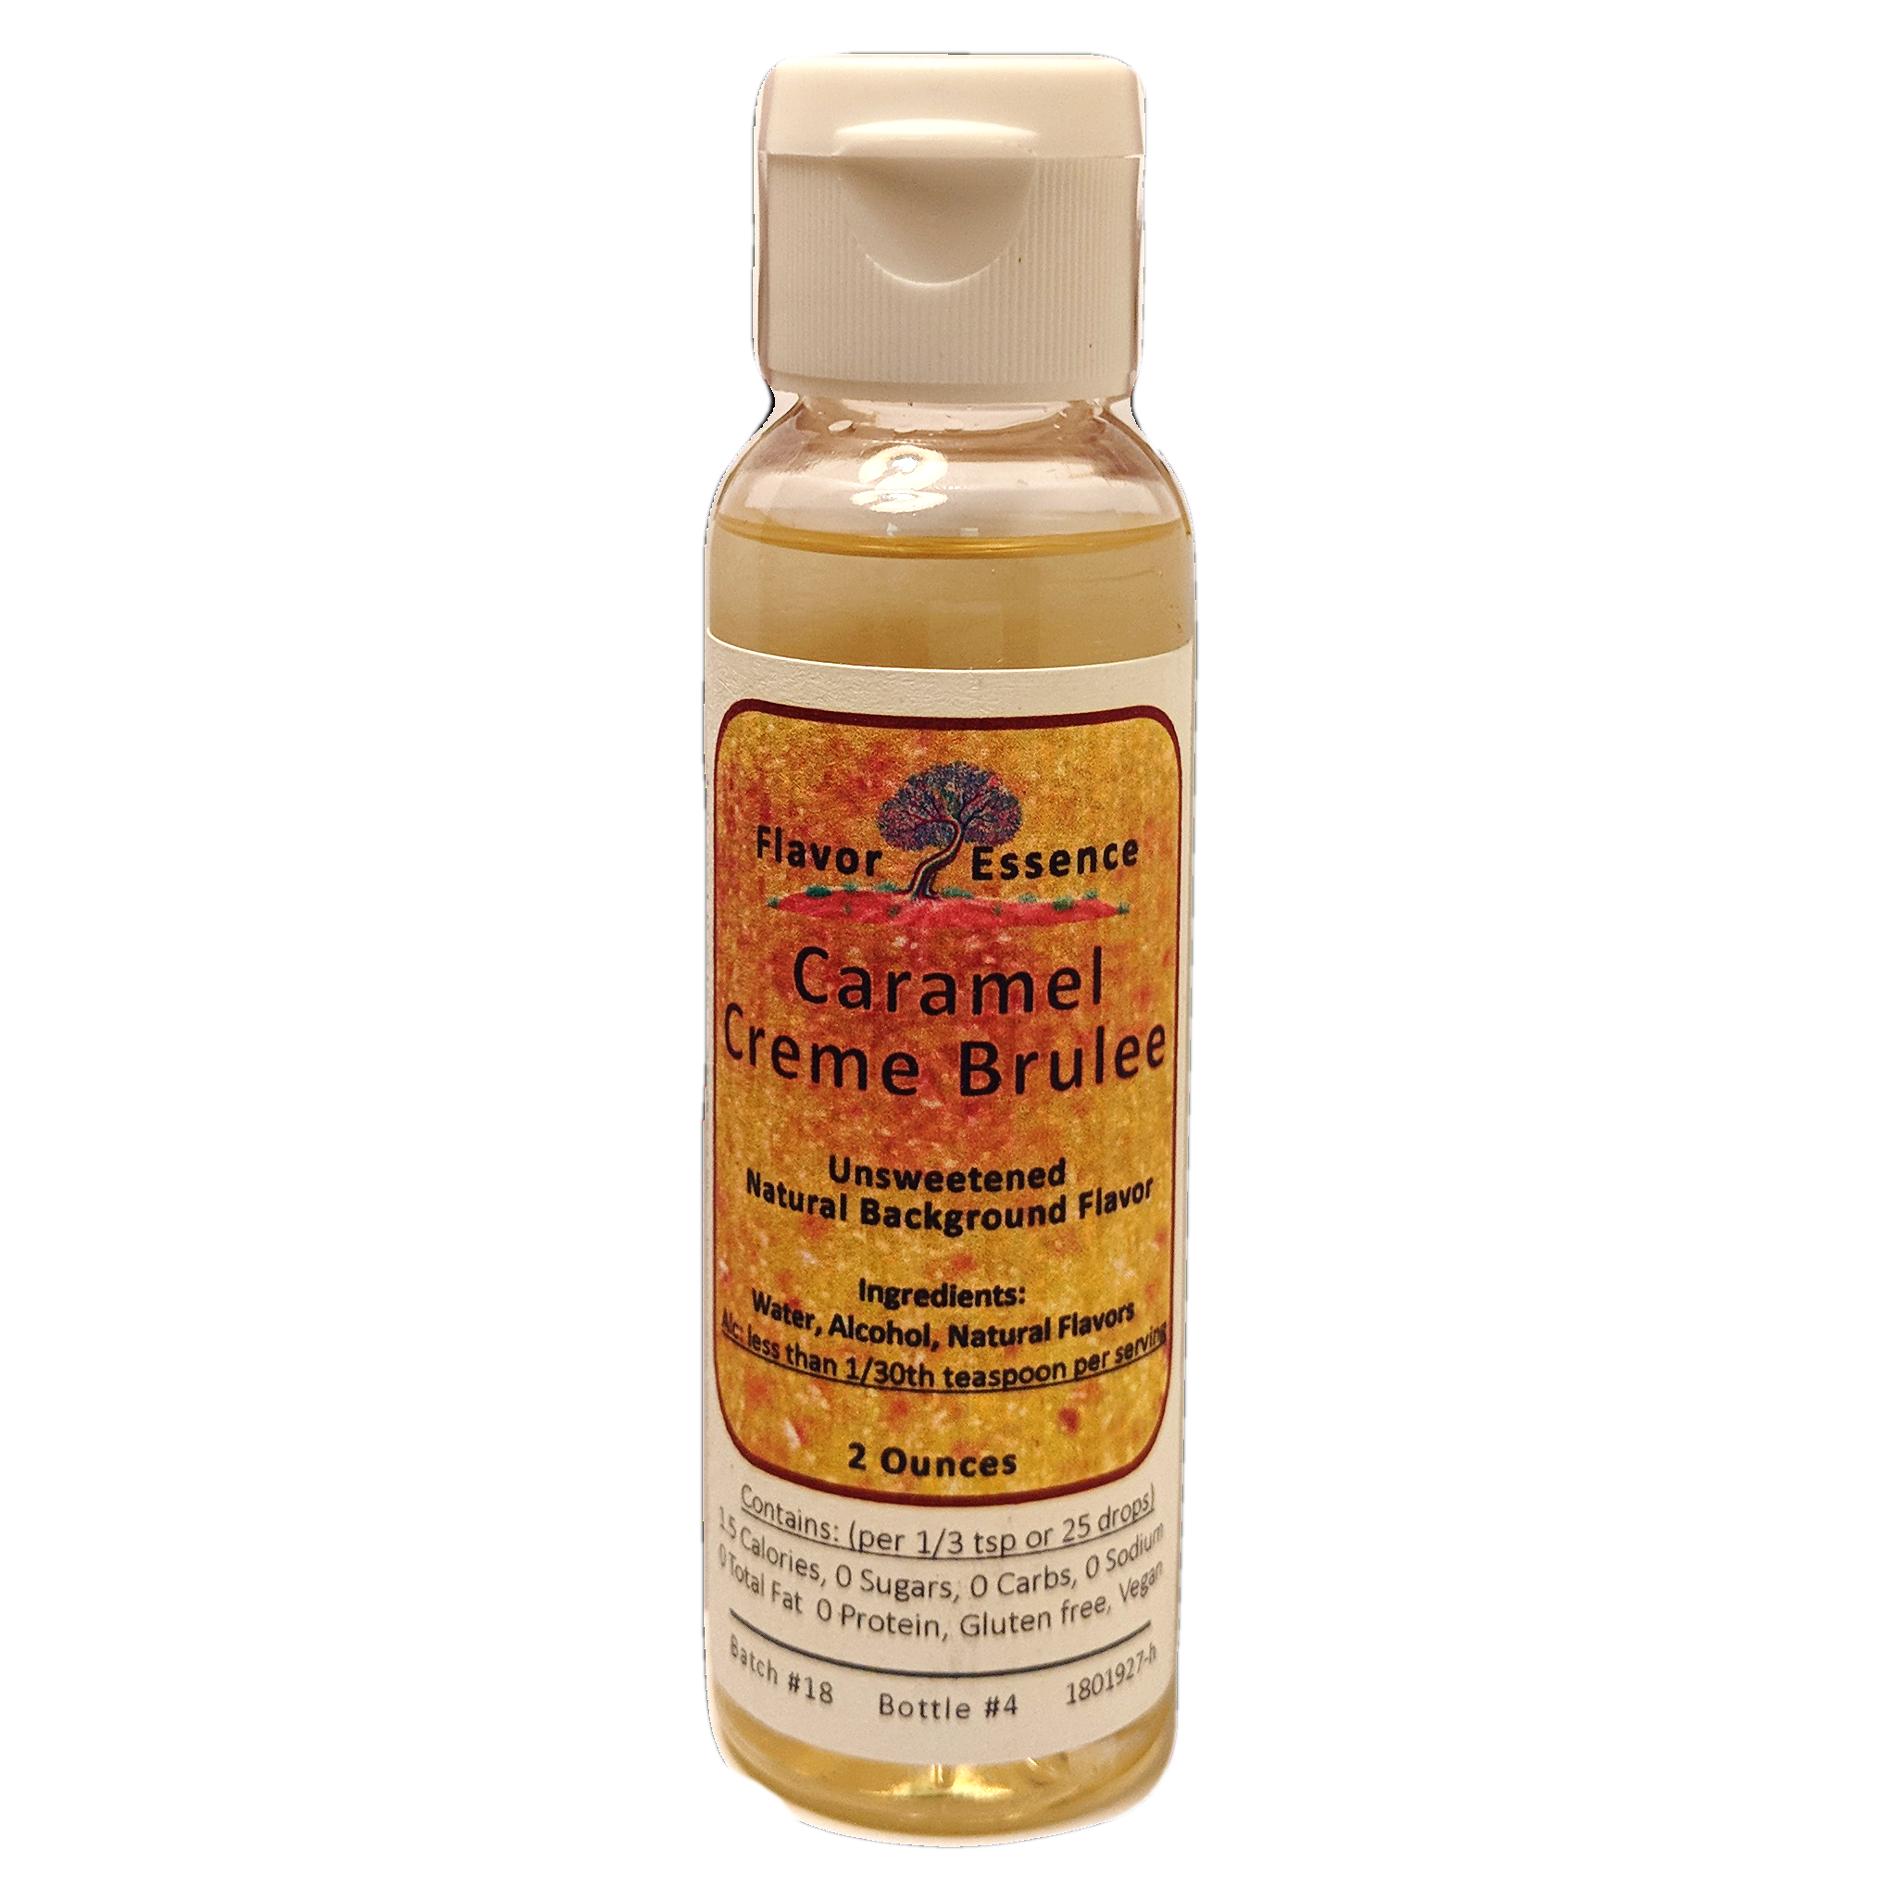 CARAMEL CREME BRULEE Unsweetened Natural Flavoring CCB-